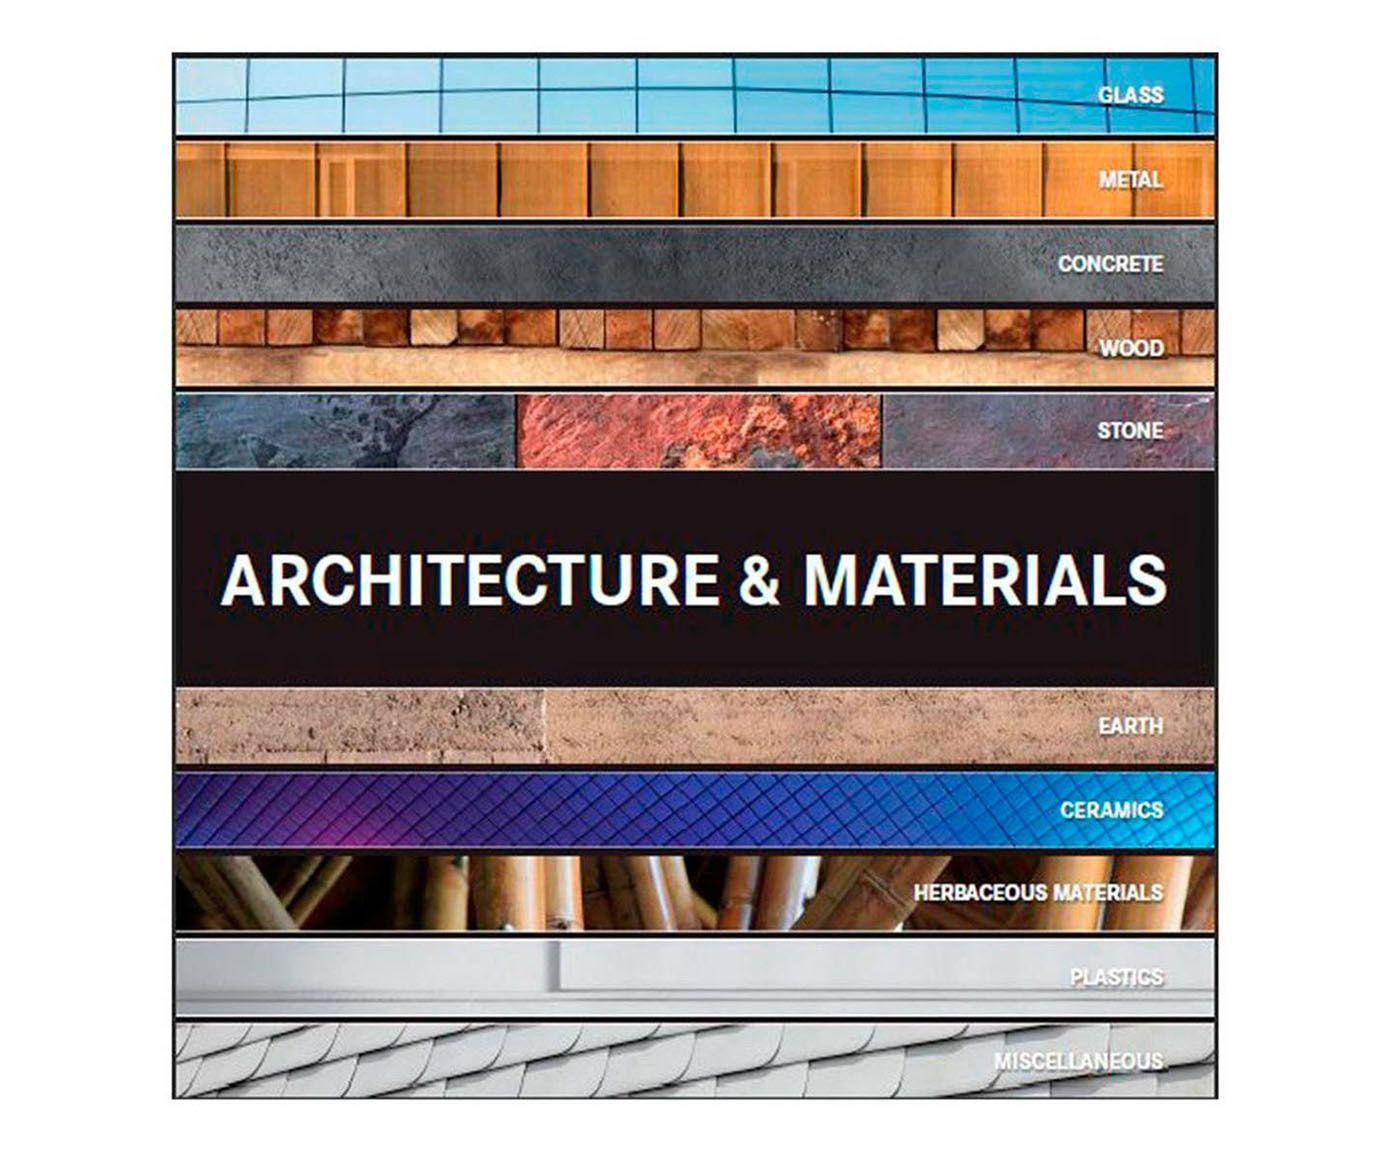 Livro Architecture e Materials | Westwing.com.br